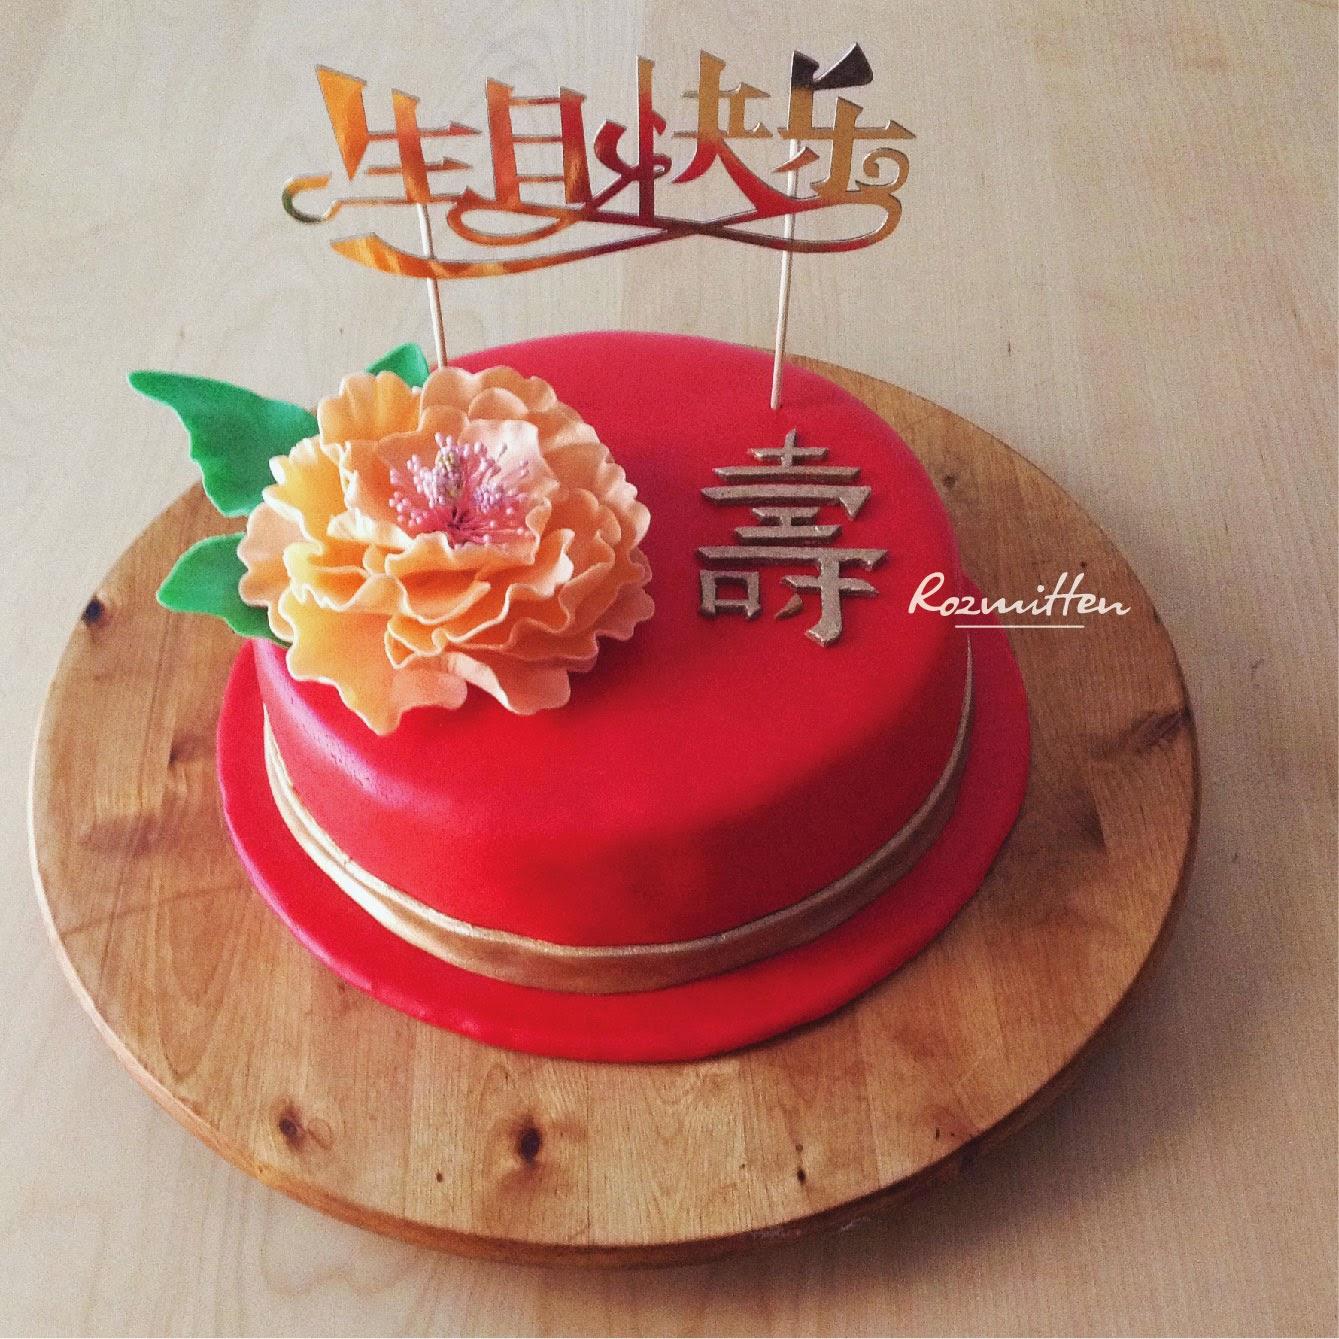 Rozmitten: Chinese Happy Birthday & Longevity Fondant Cake